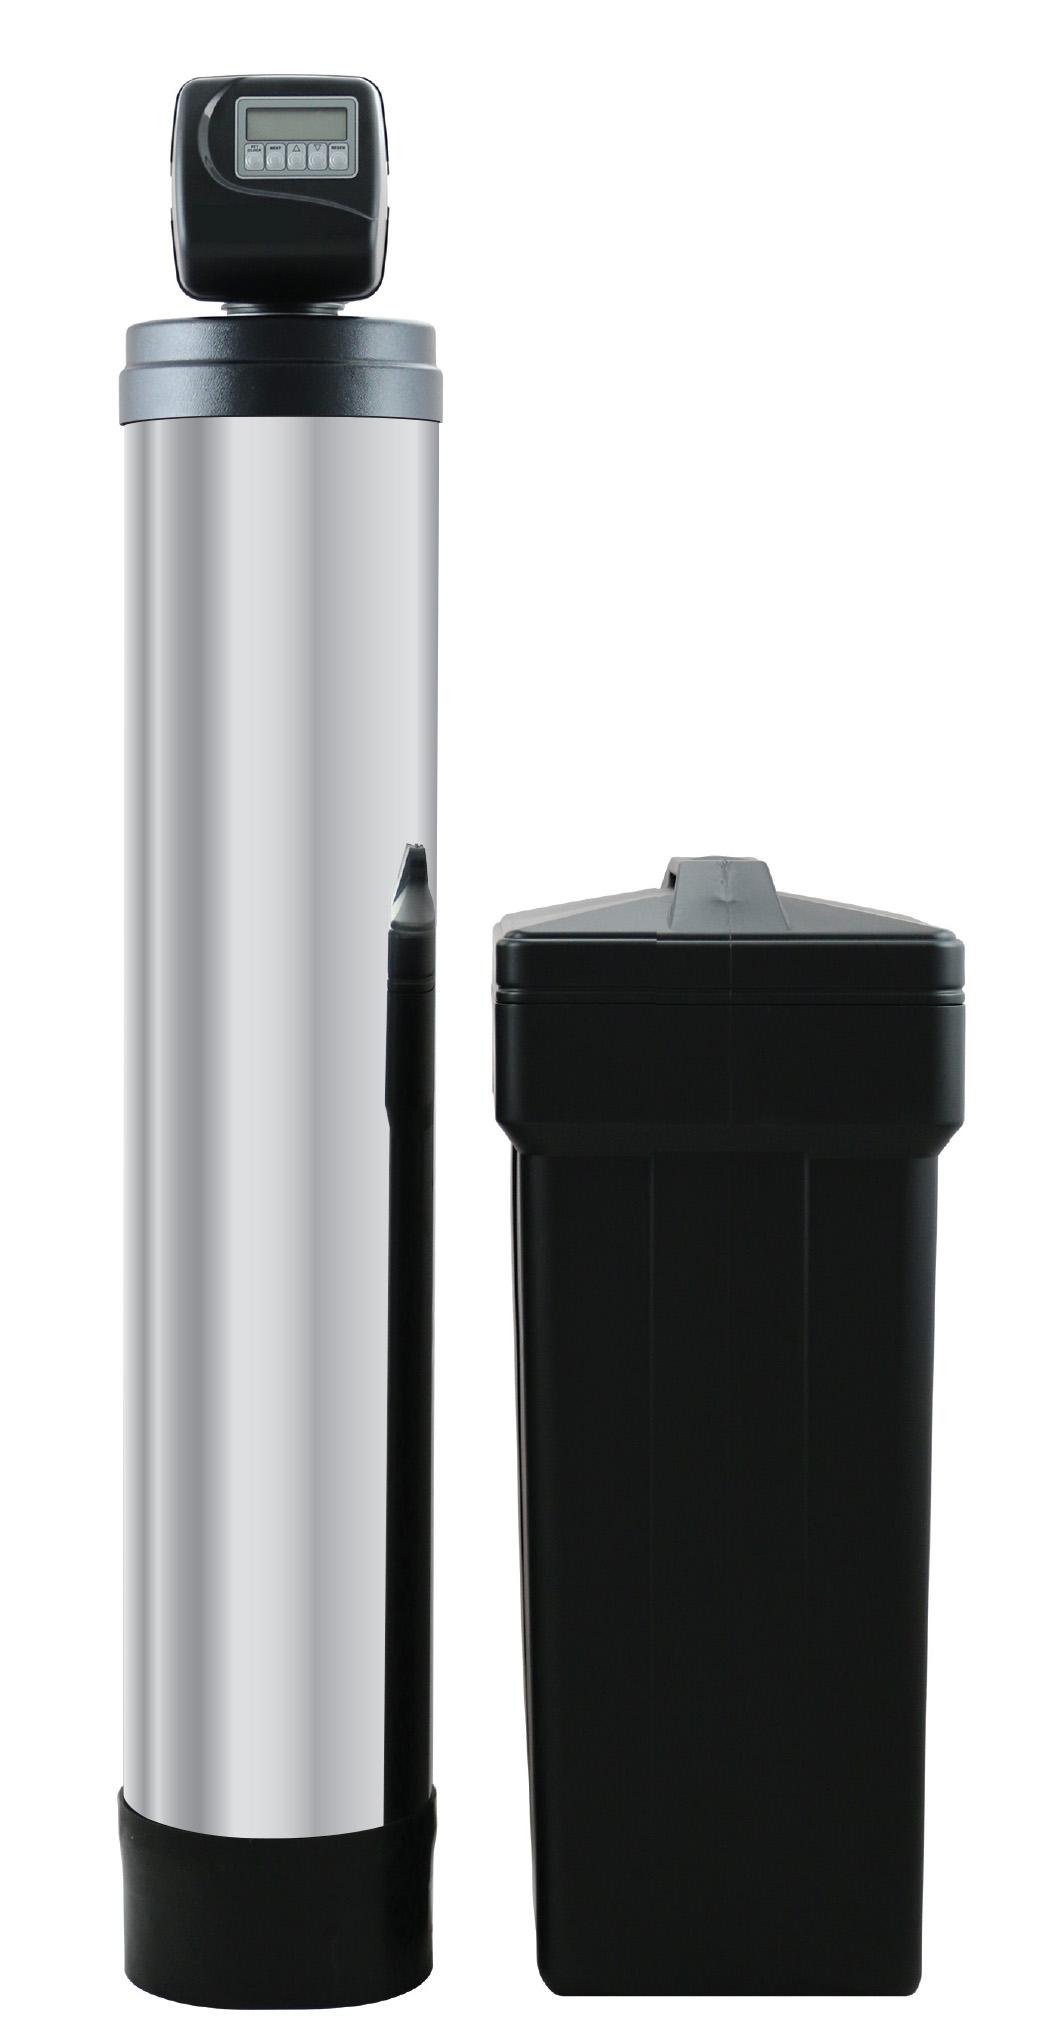 clack ws1 water softener